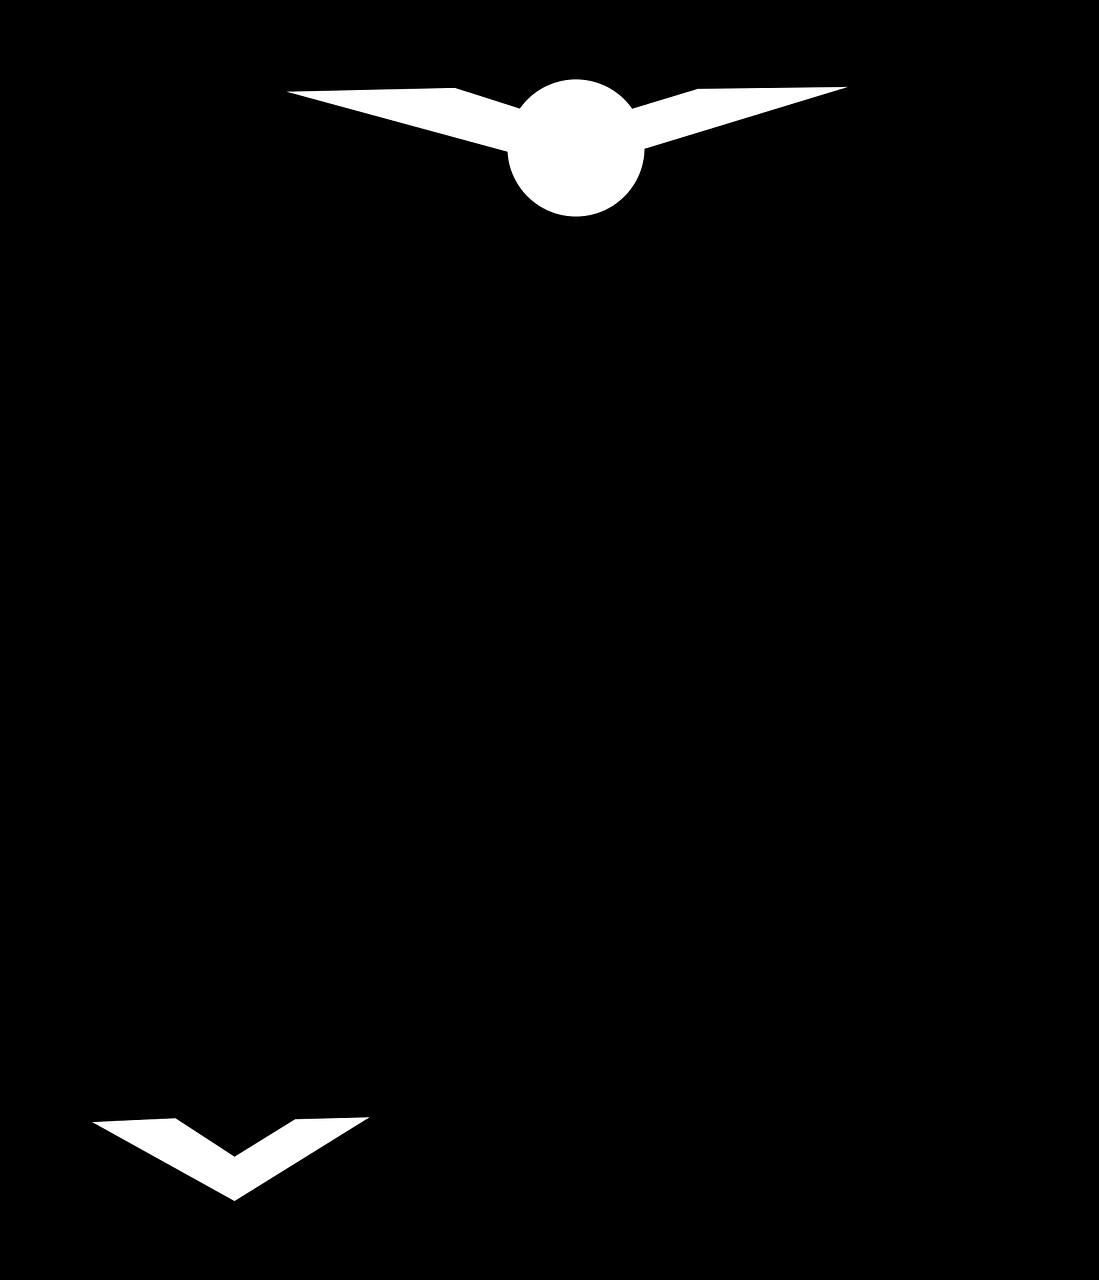 airplane-1295845_1280